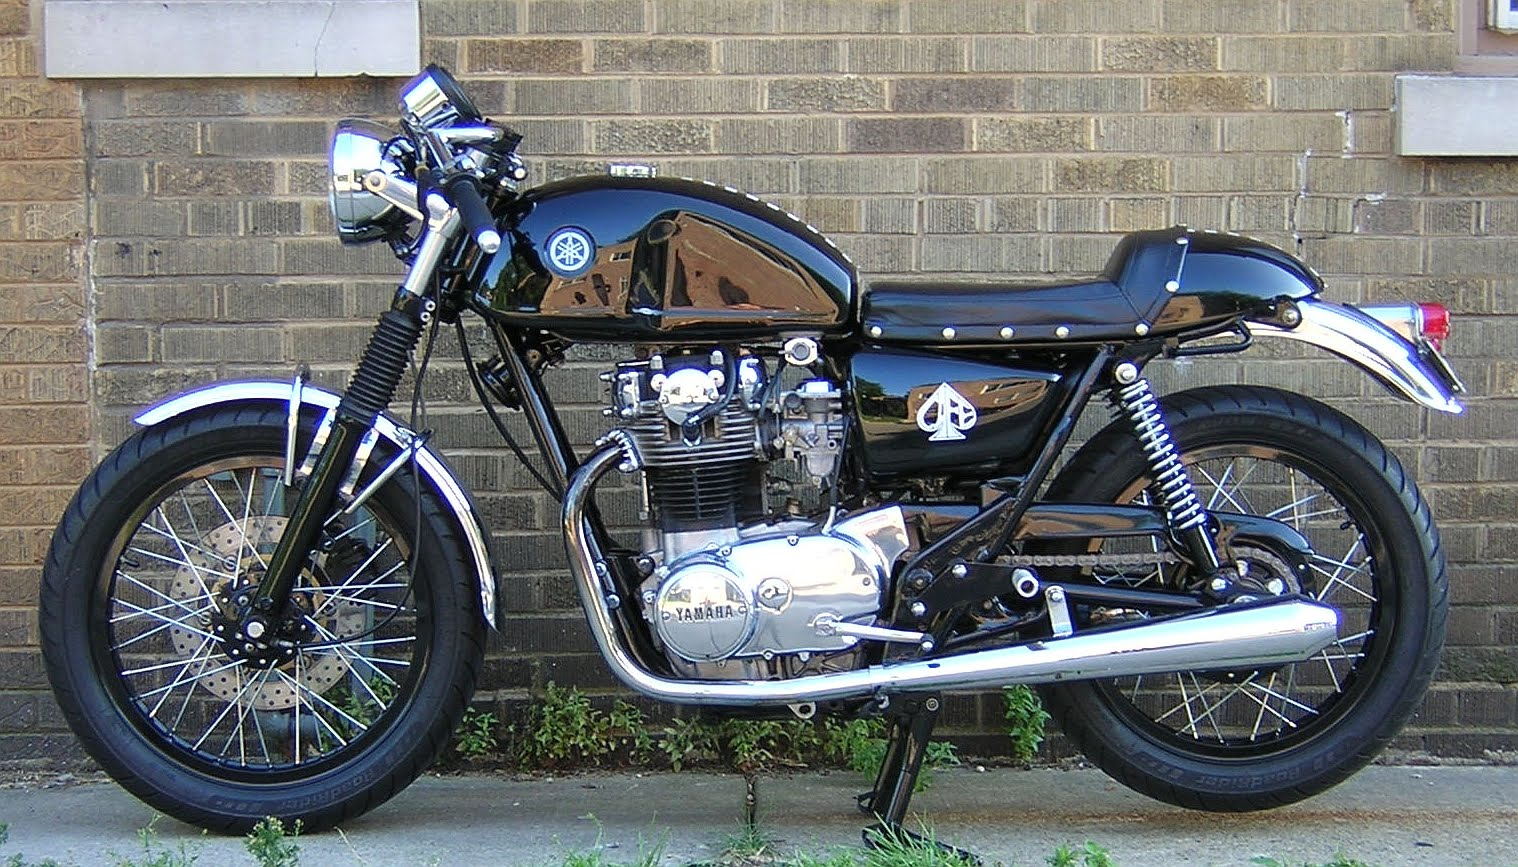 Yamaha Xscafe Racer For Sale